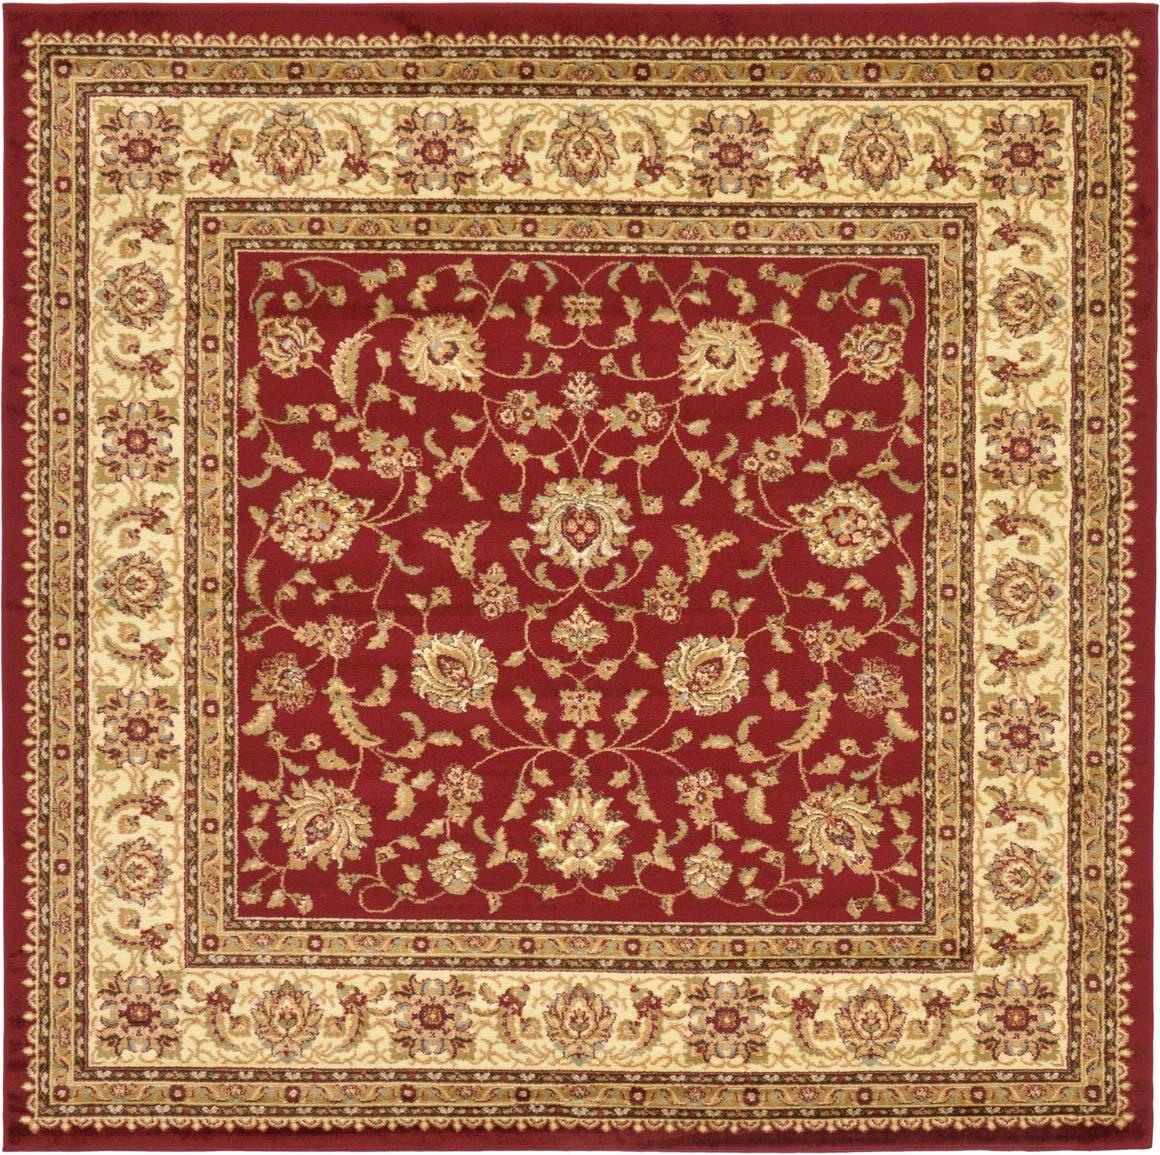 8' x 8' Classic Agra Square Rug main image